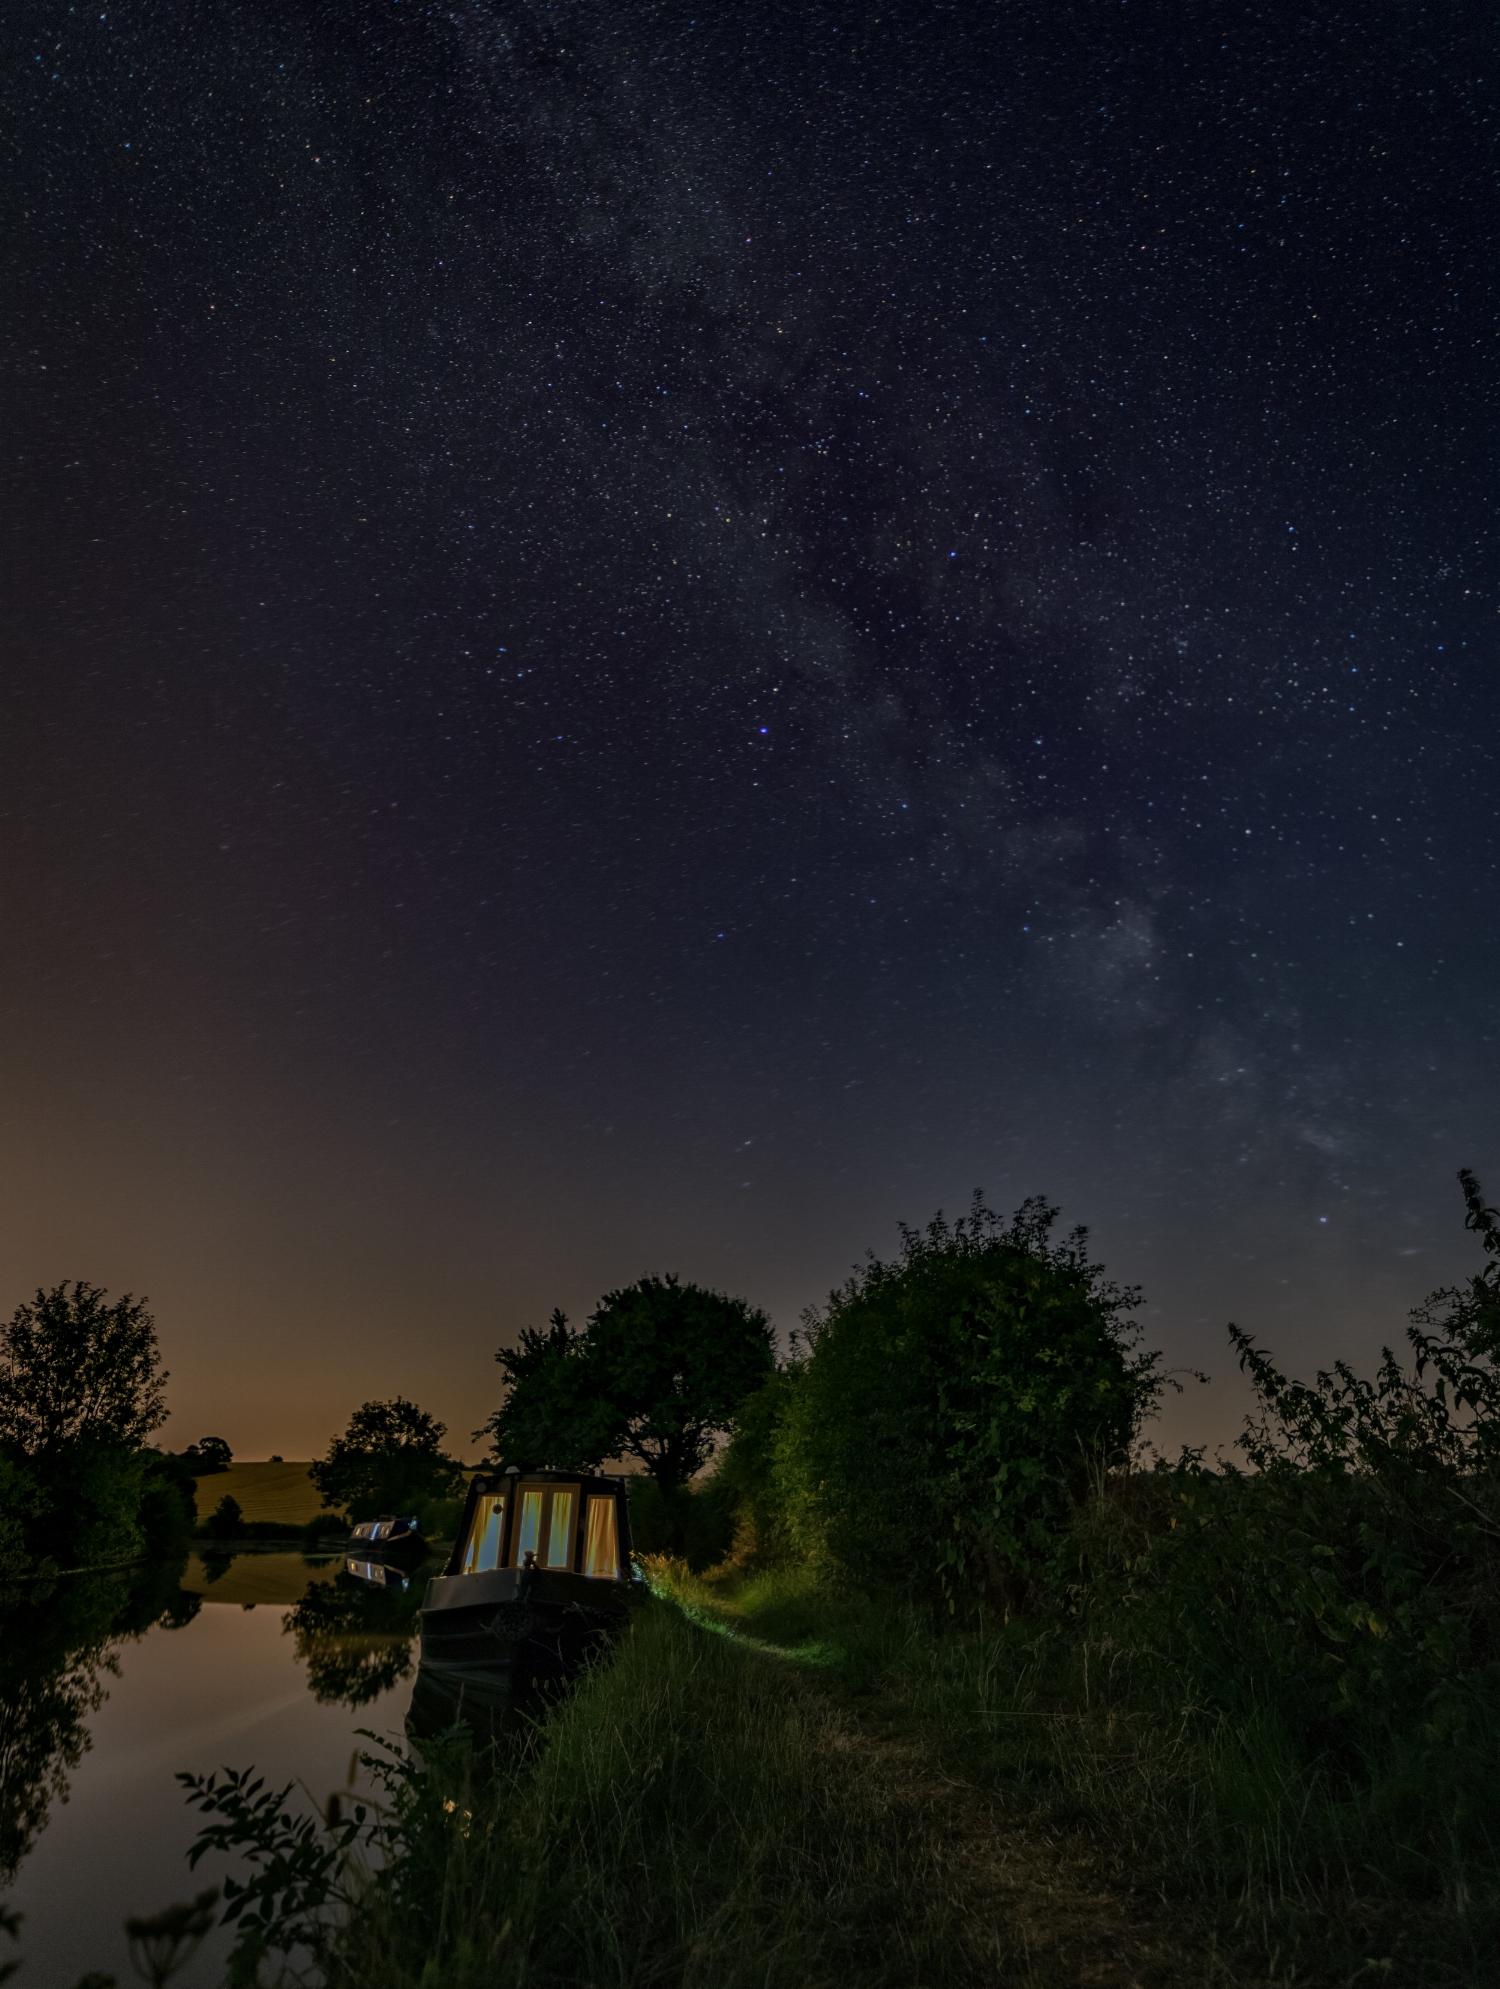 Milky Way Canals